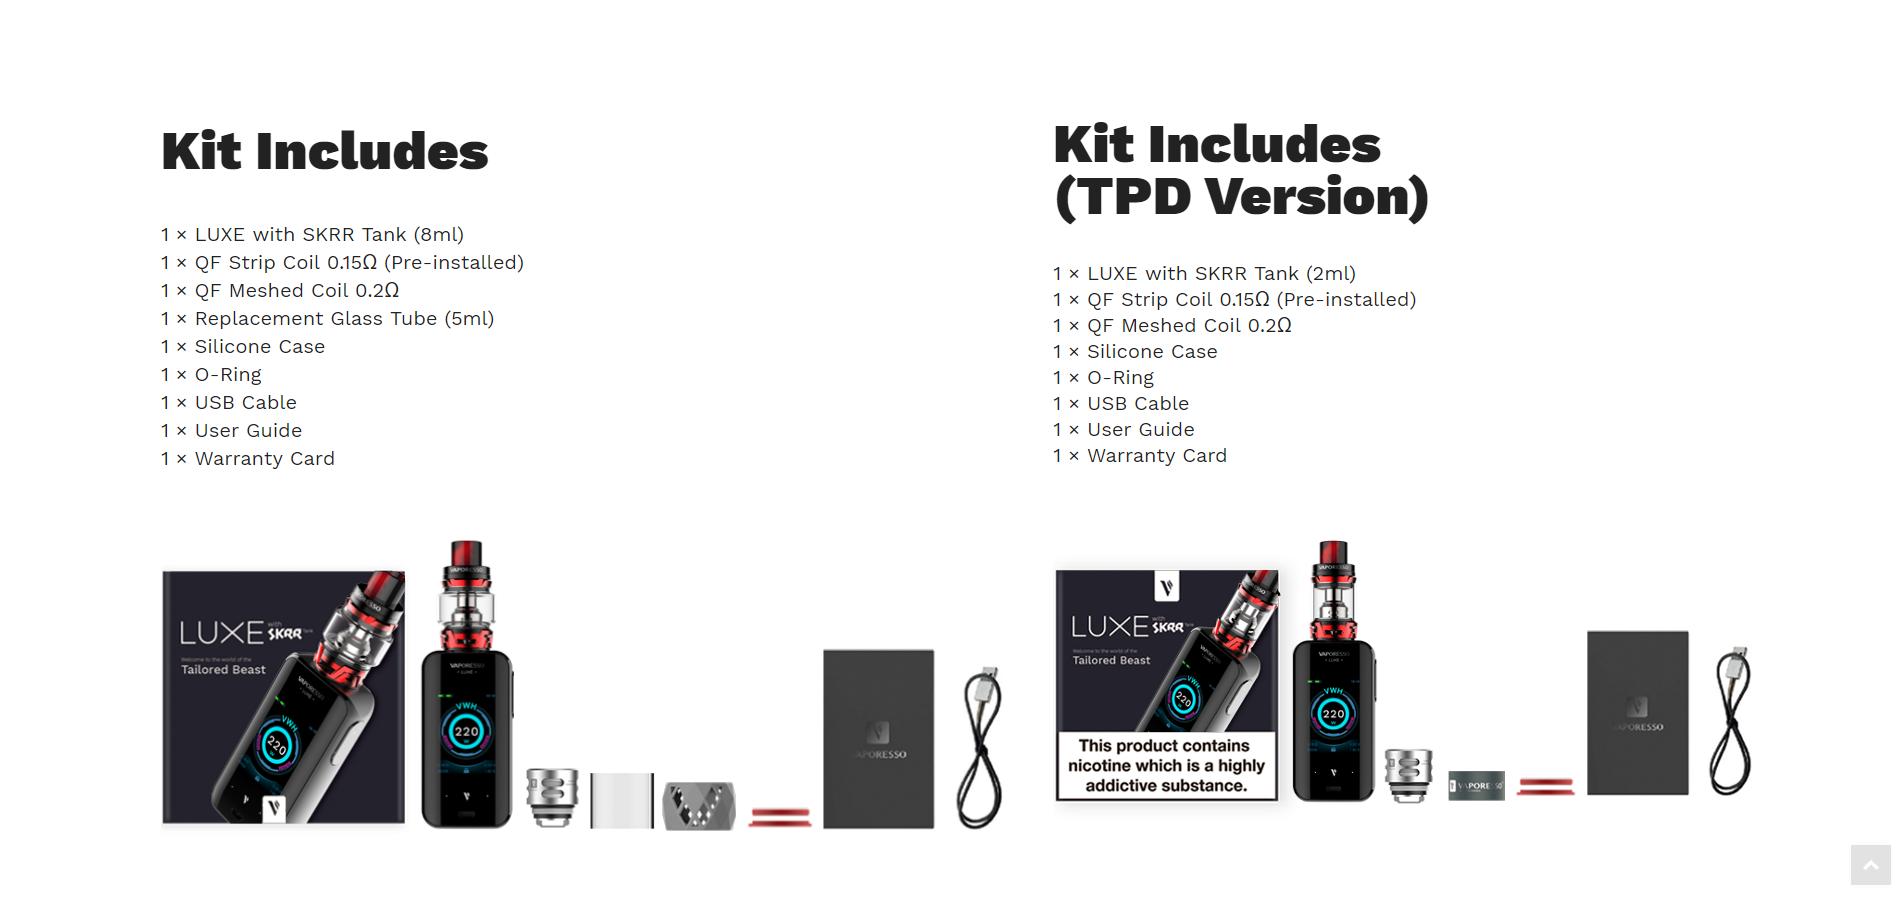 Vaporesso Luxe Kit kopen, Vaporesso Luxe Kit kopen Belgie, Vaporesso Luxe Kit kopen Nederland, Vaporesso Luxe Kit kopen online